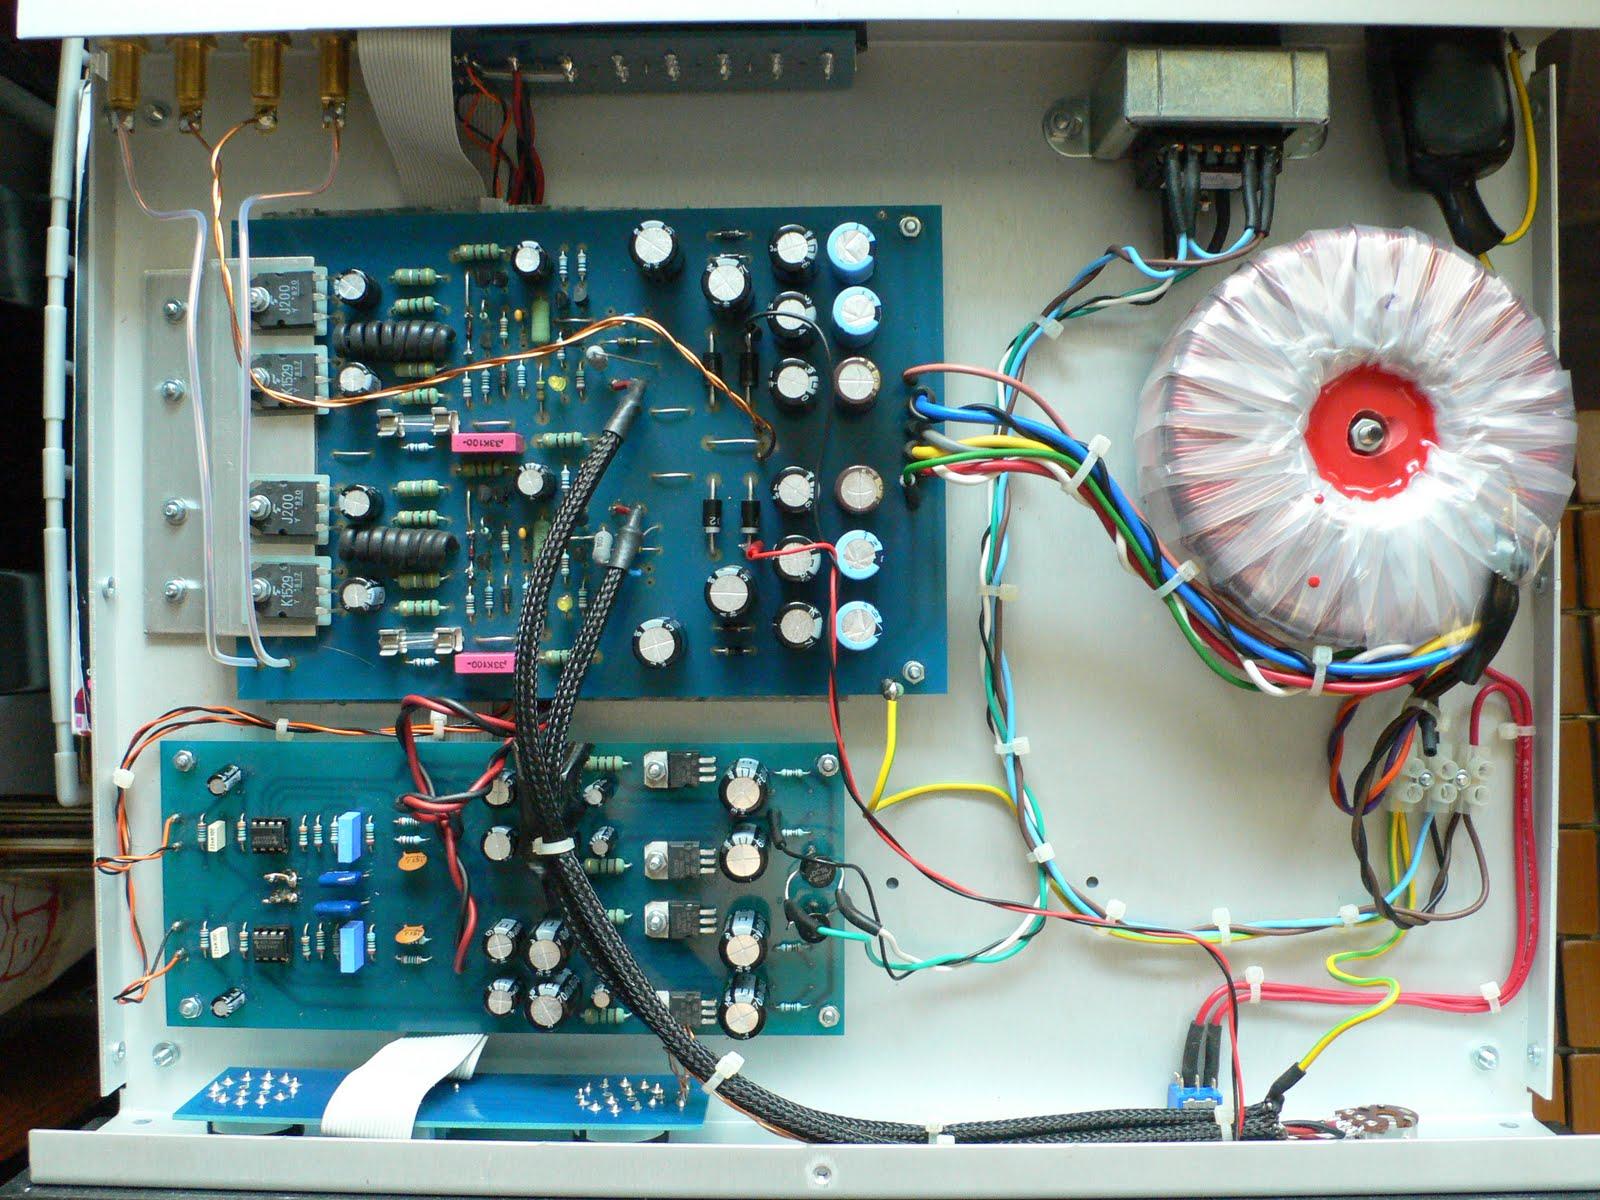 Doctorjohn Cheaptubeaudio Audio Reviews And More August 2011 Headphone Amplifier Diy Kit Base On Lehmann Amp Circuit